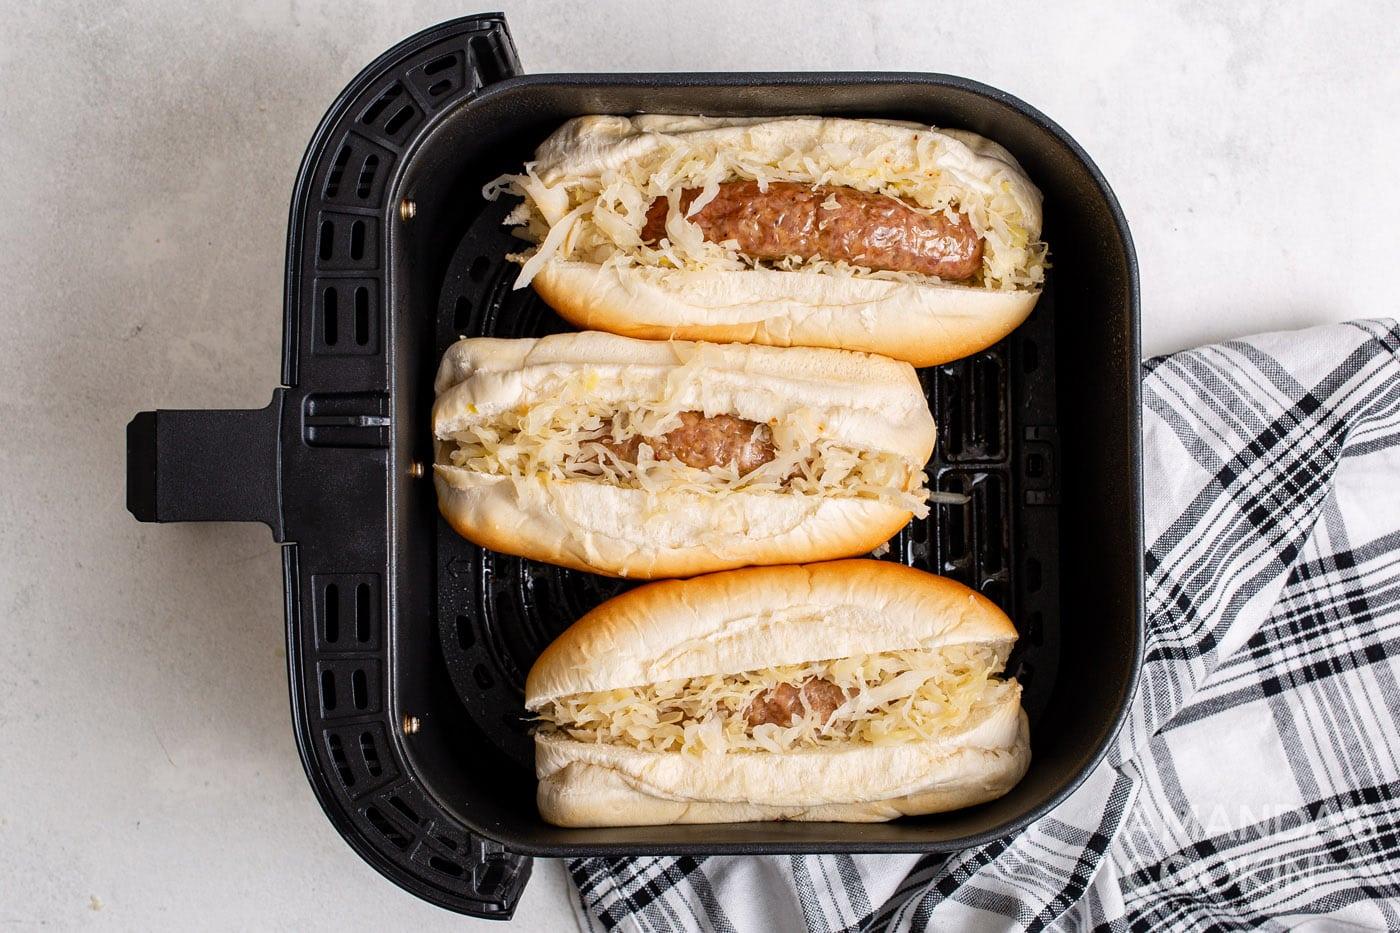 sauerkrat and on bratwurst with buns